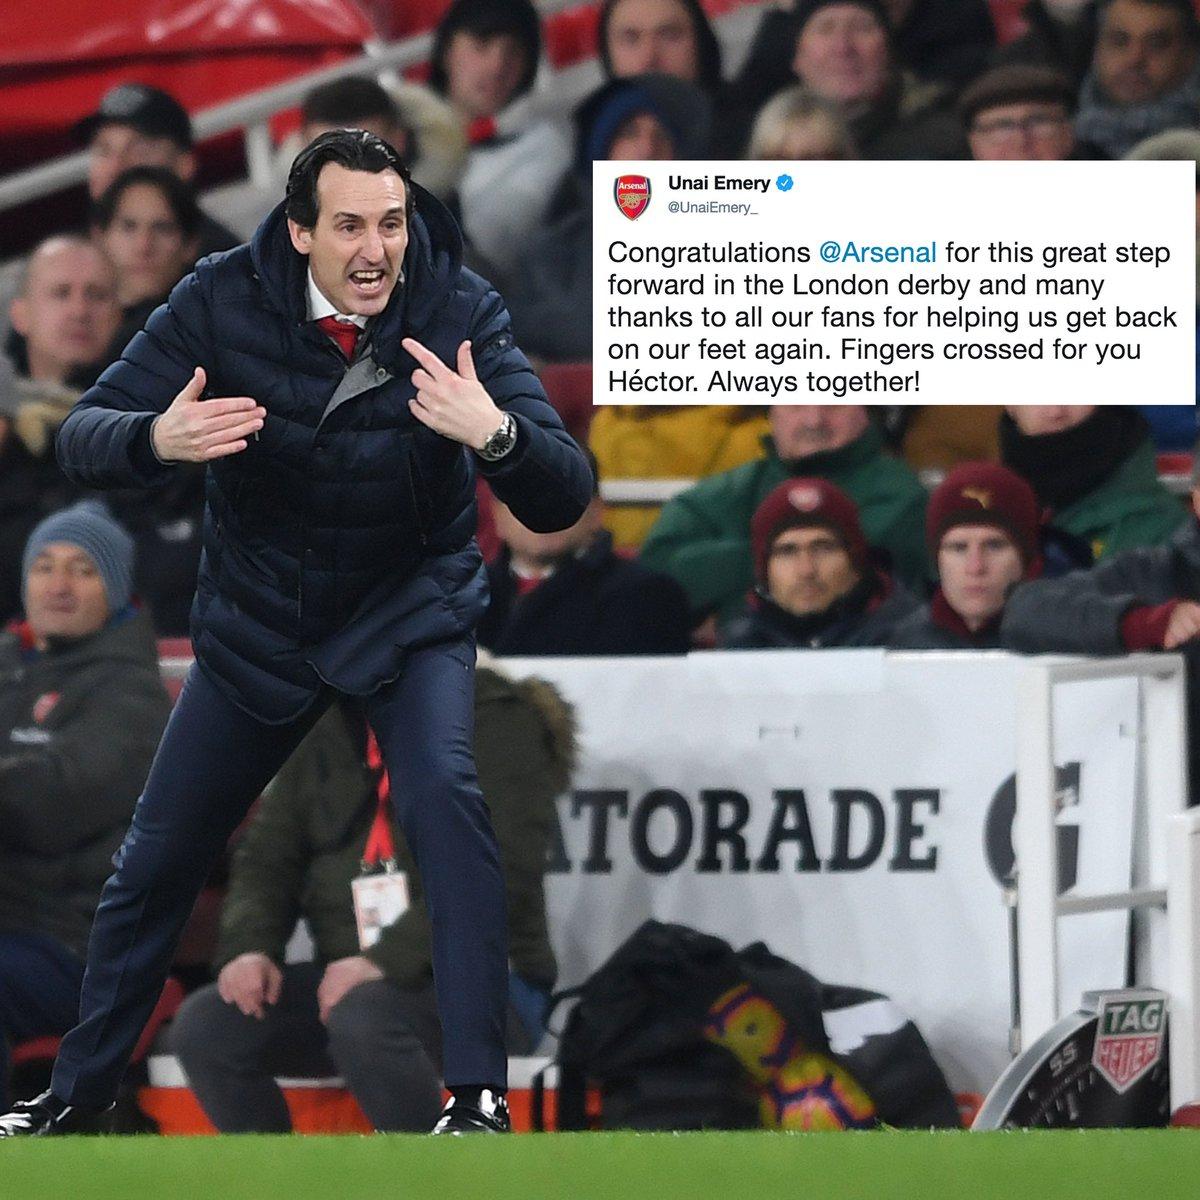 Arsenal FC @Arsenal